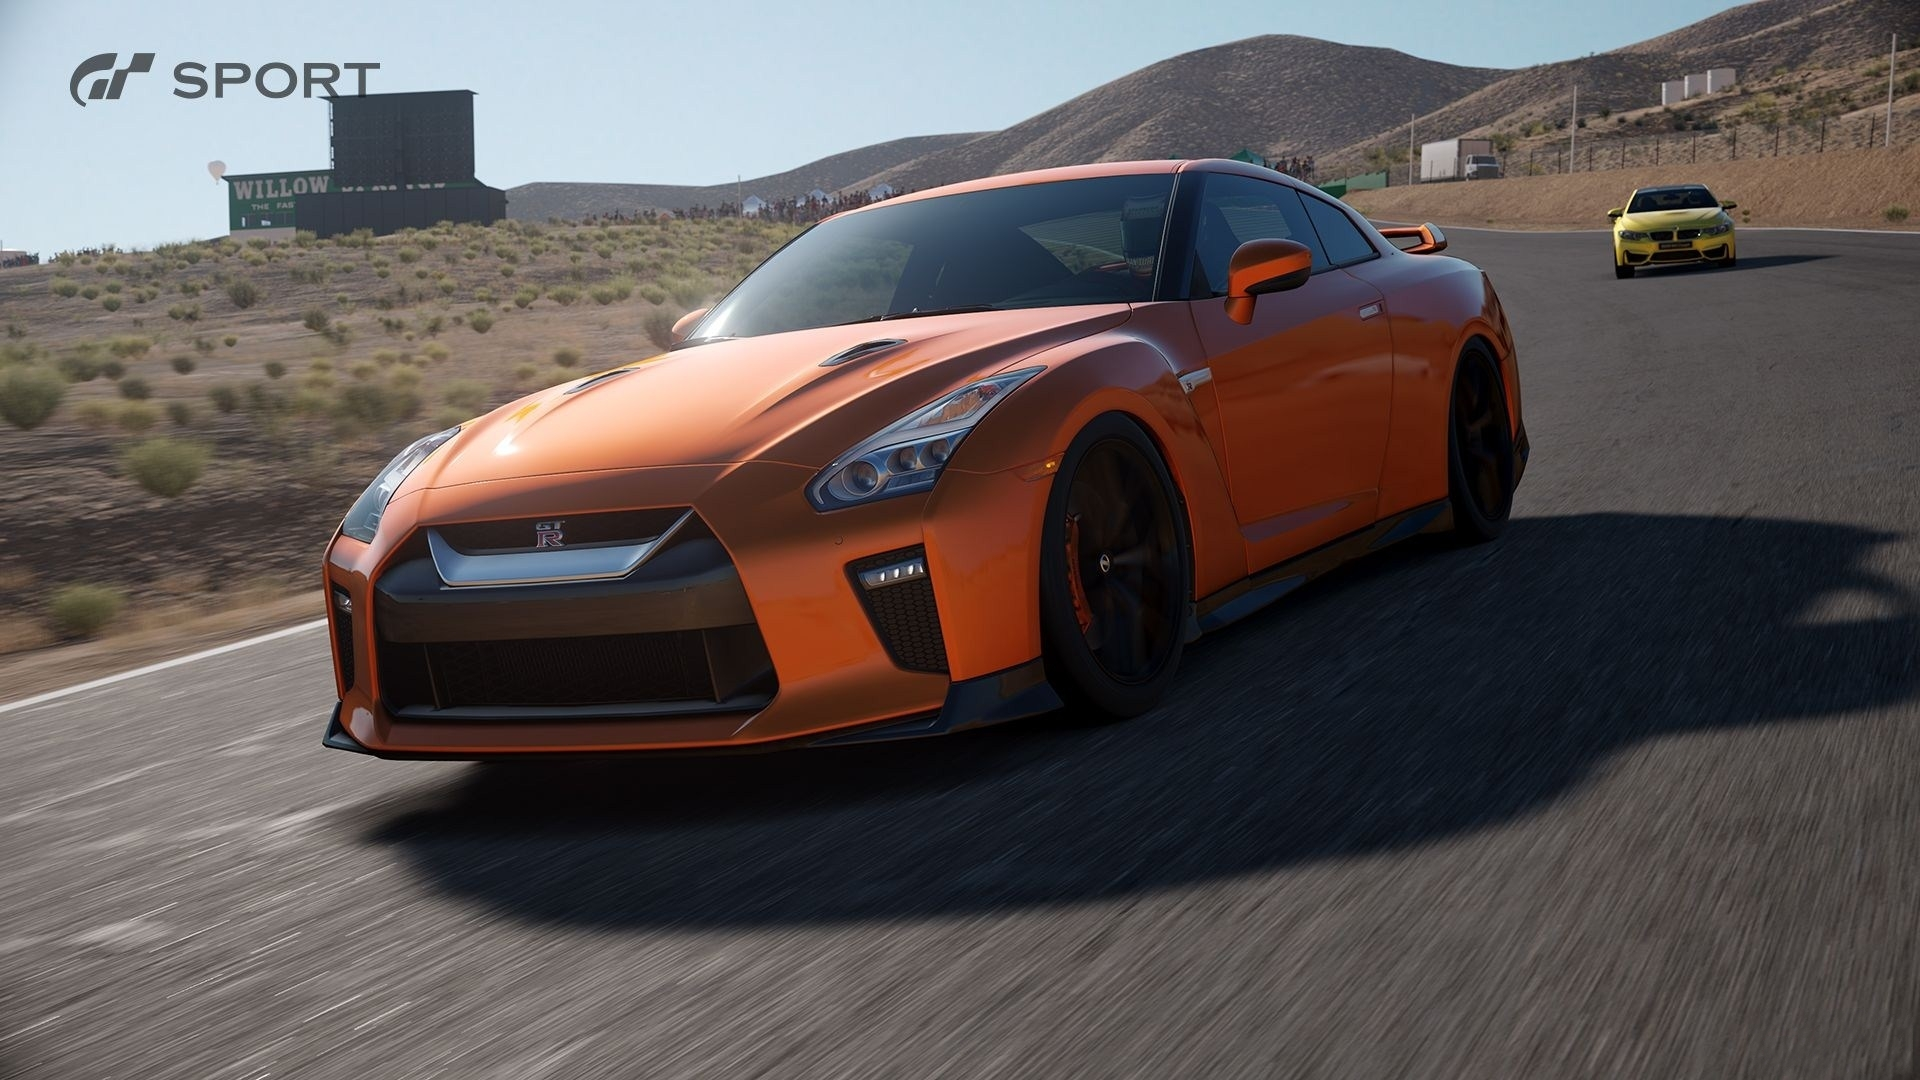 《GT SPORT》将和FIA合作